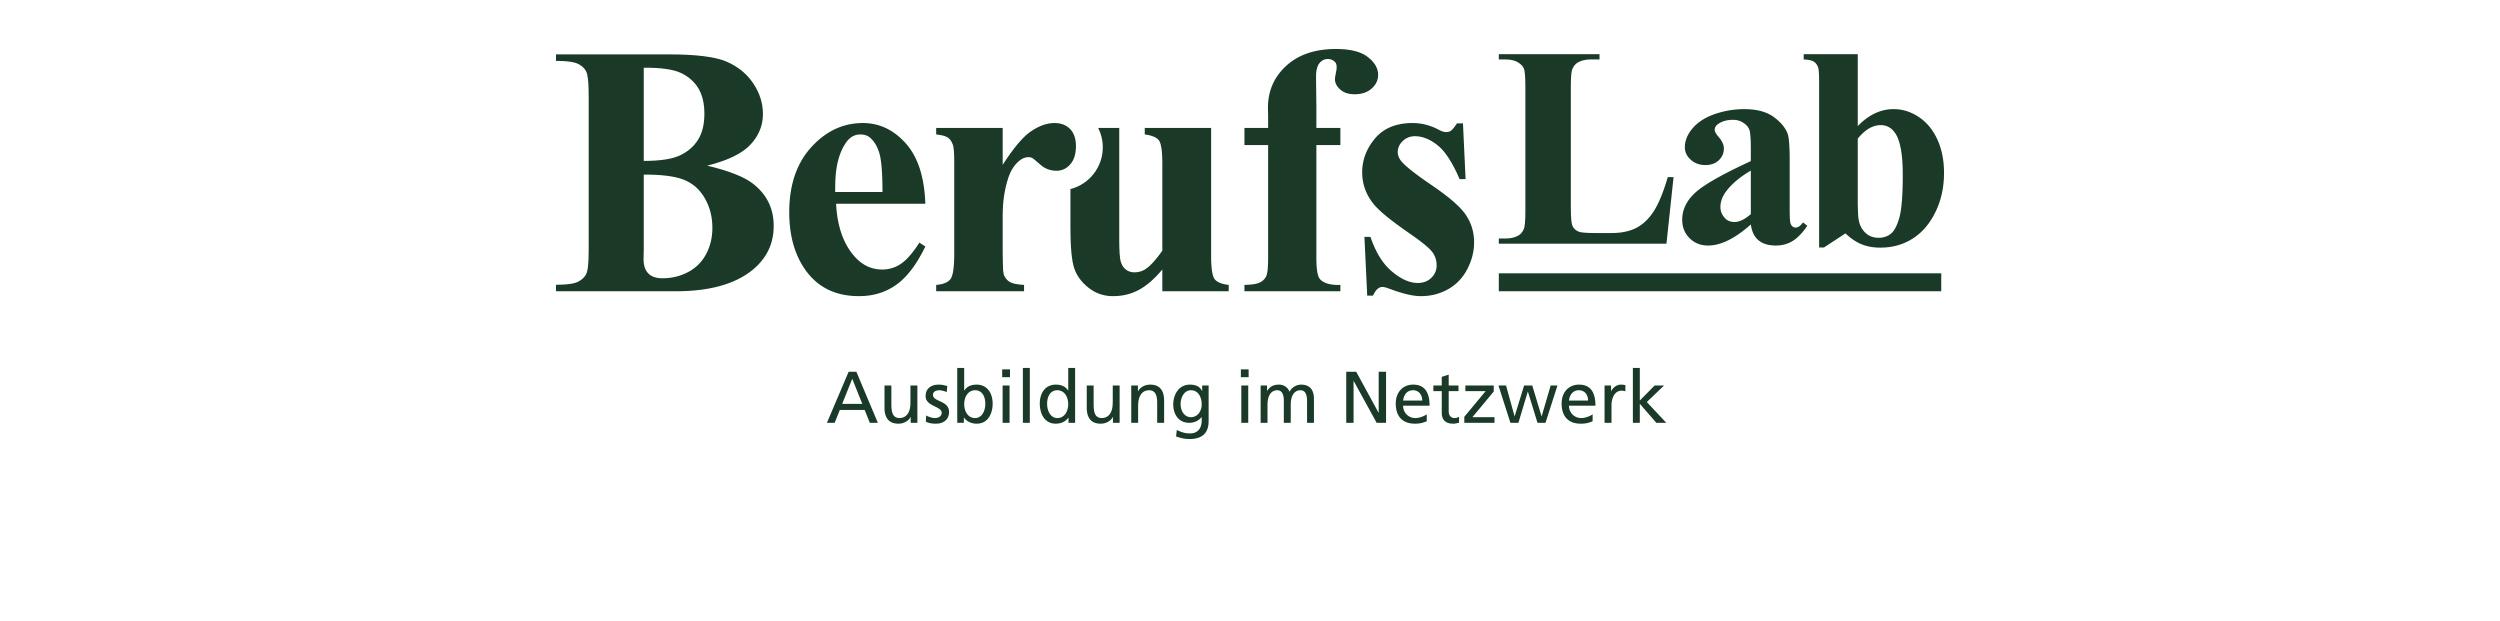 berufslab-logo